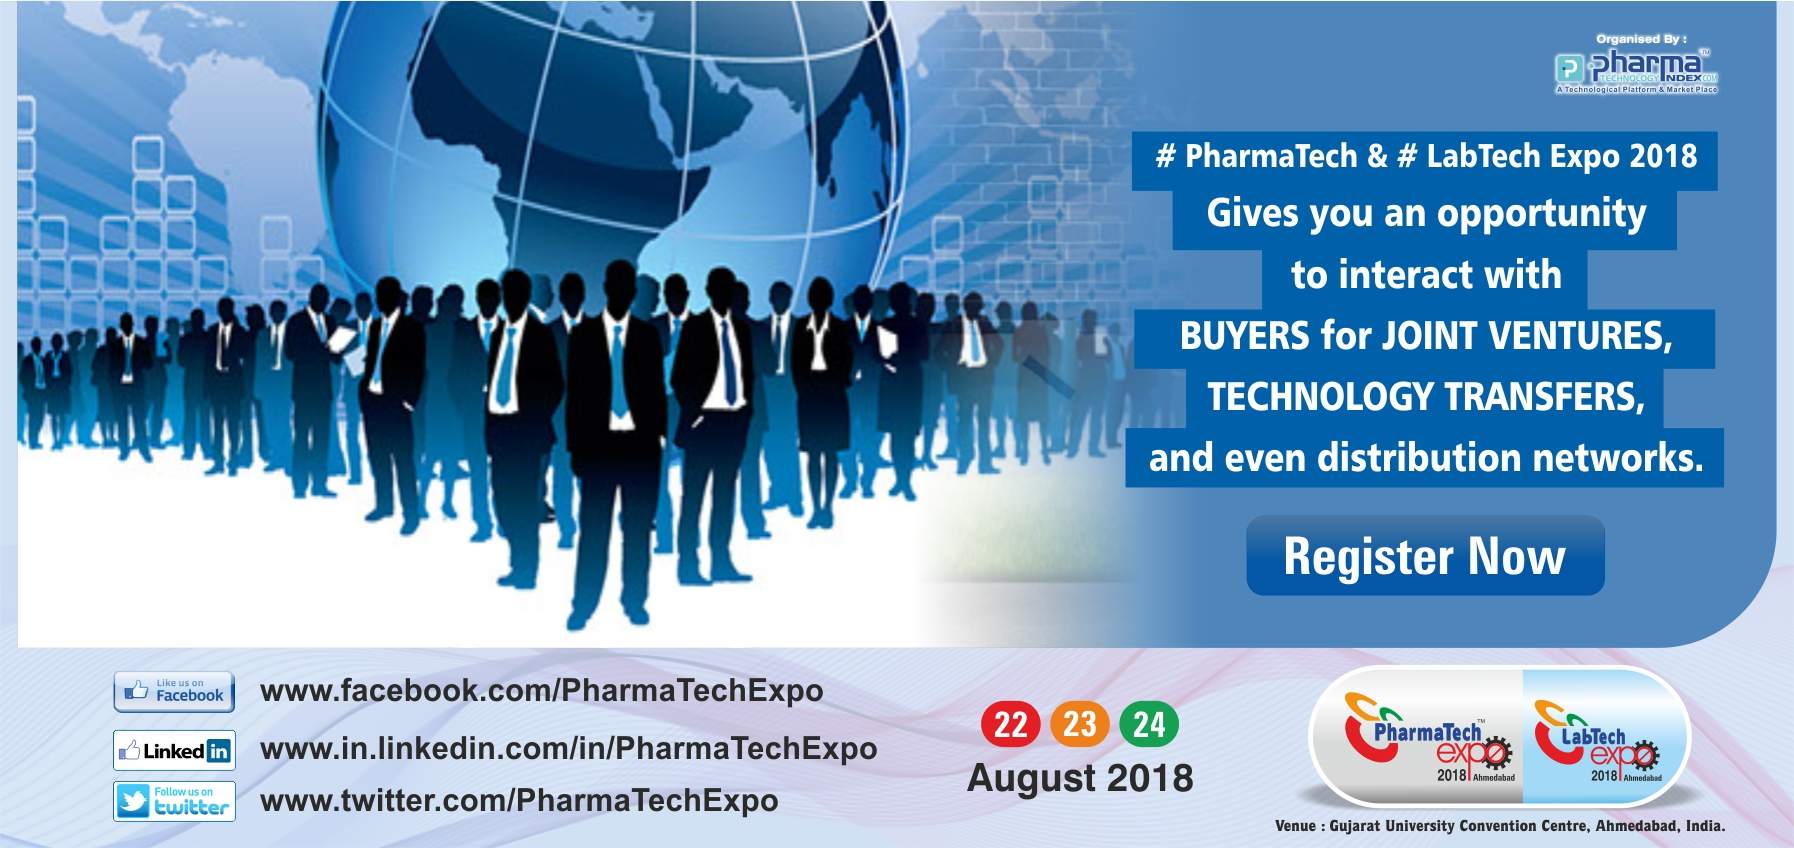 PharmaTech Expo -Western India's largest Pharma & Lab Expo, Ahmedabad, Gujarat, India